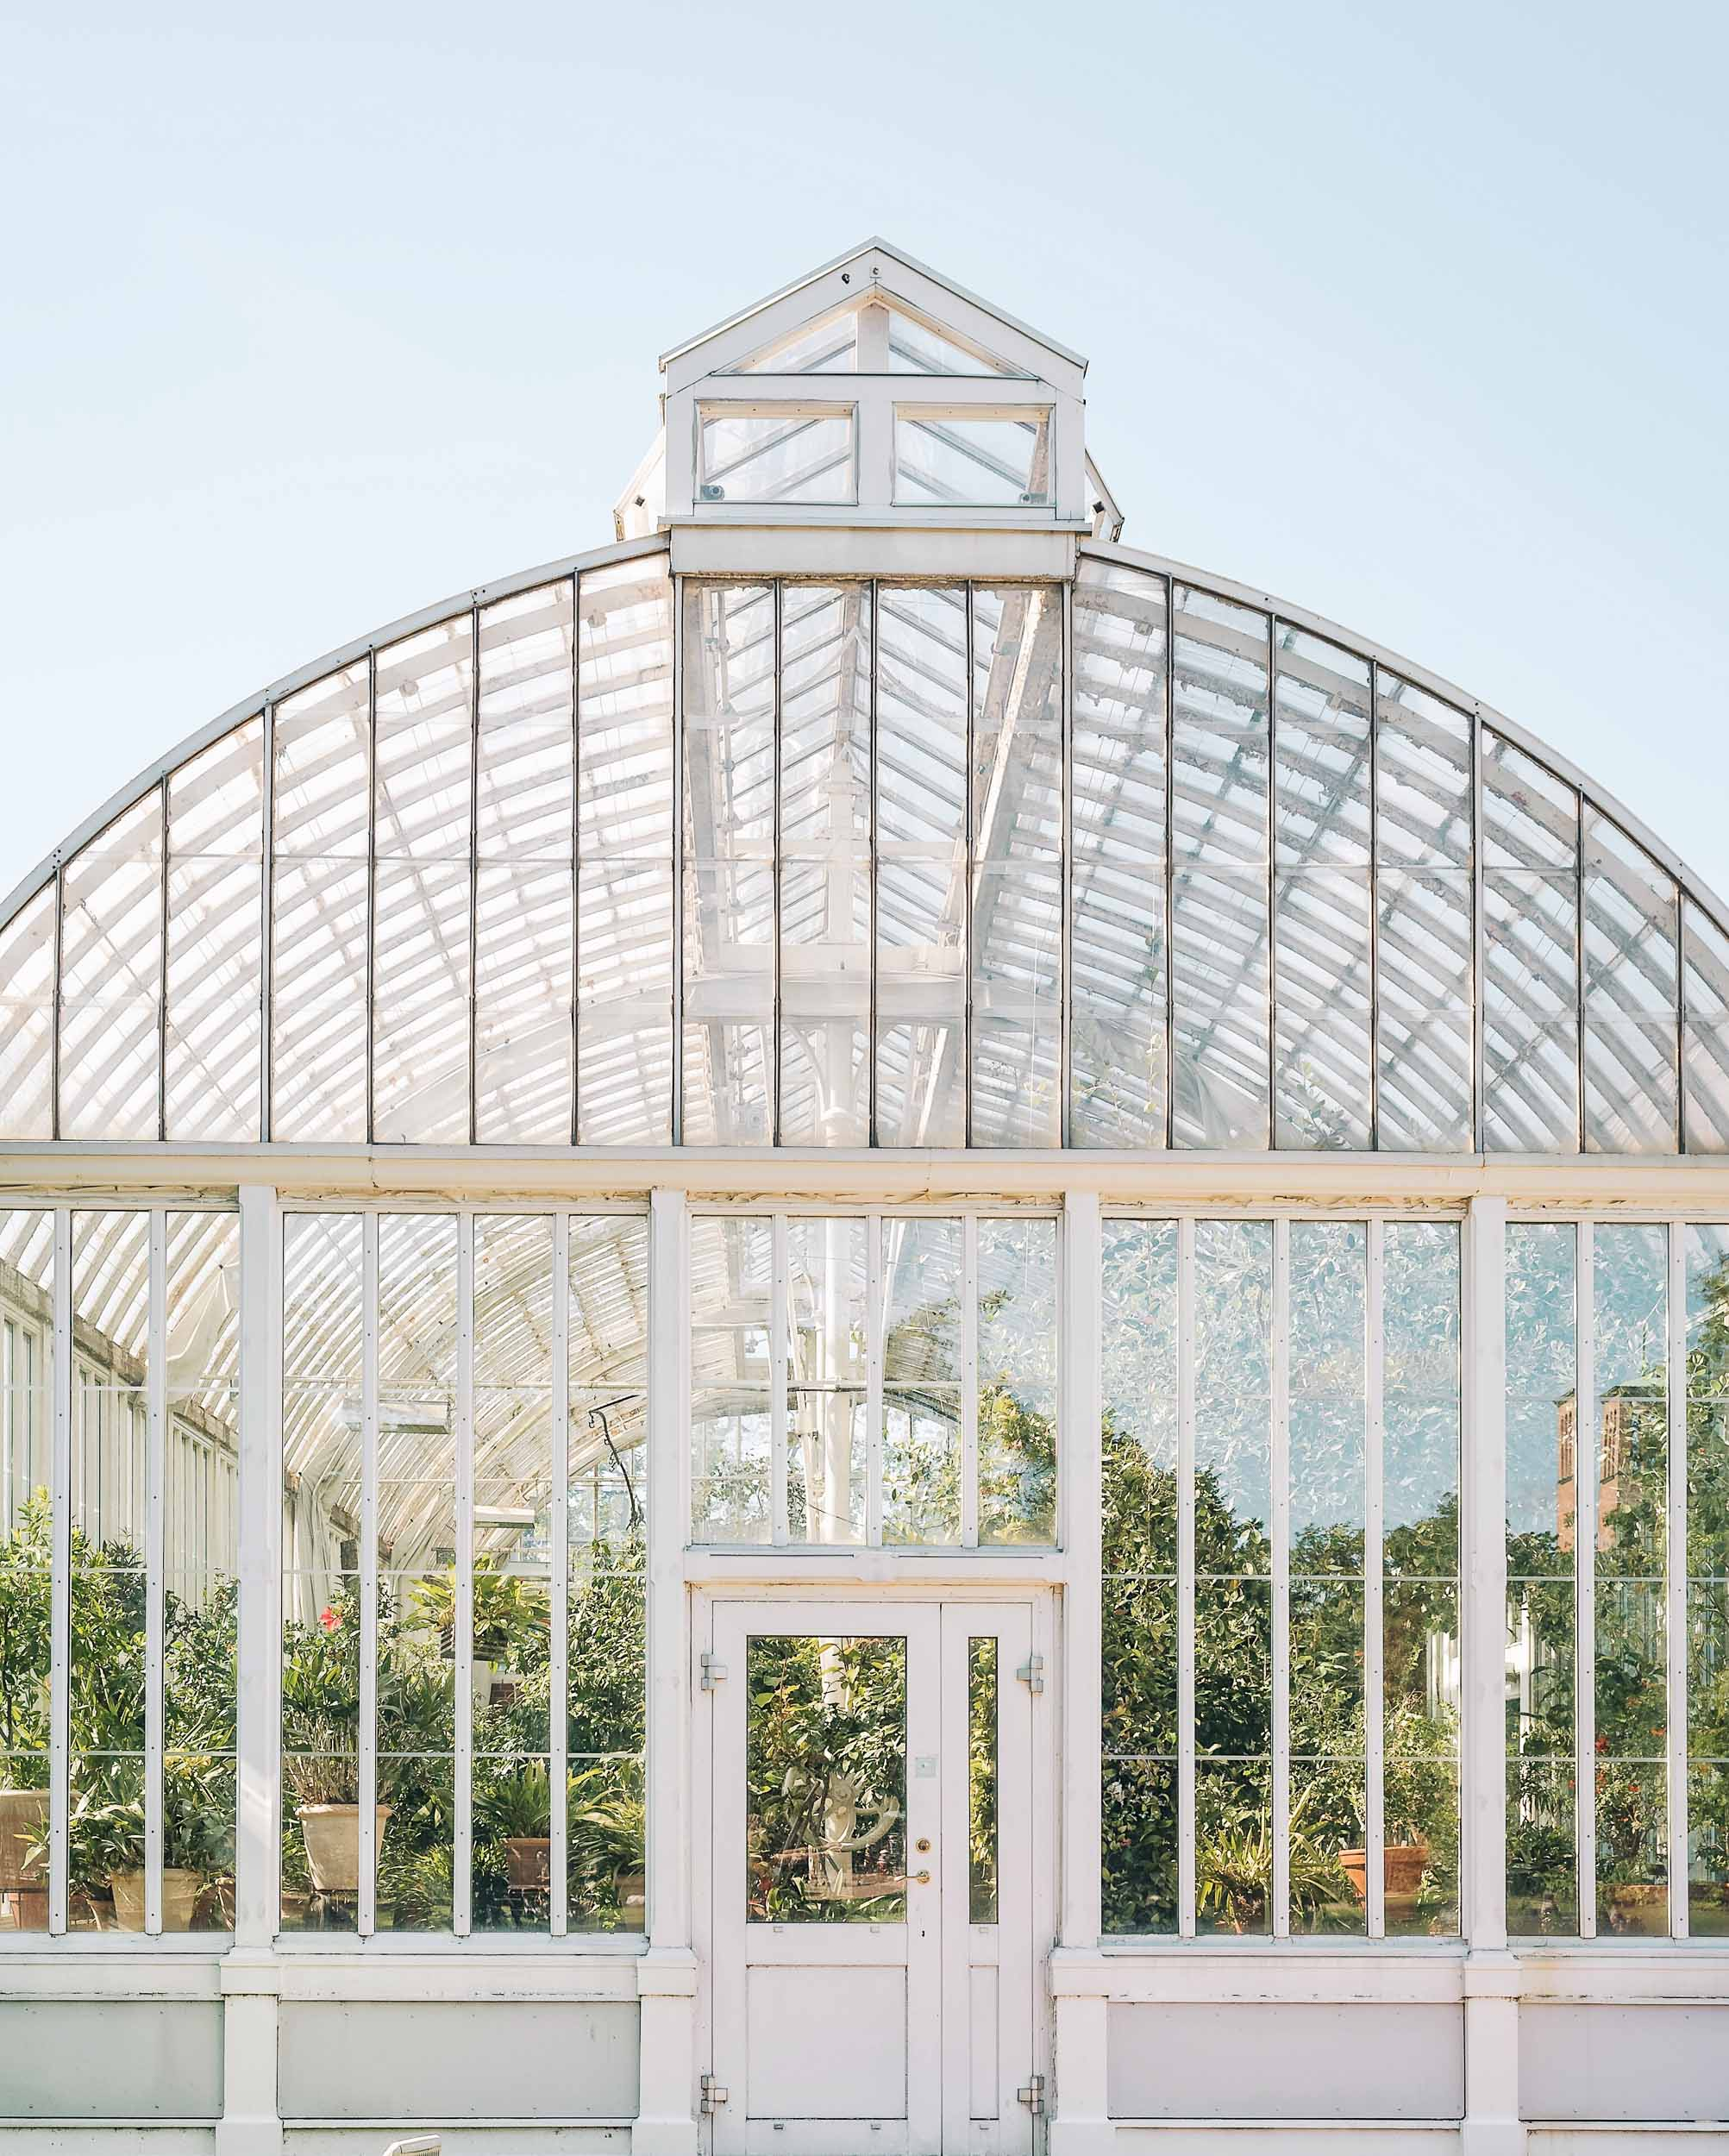 Visit the Palm House at Garden Society of Gothenburg